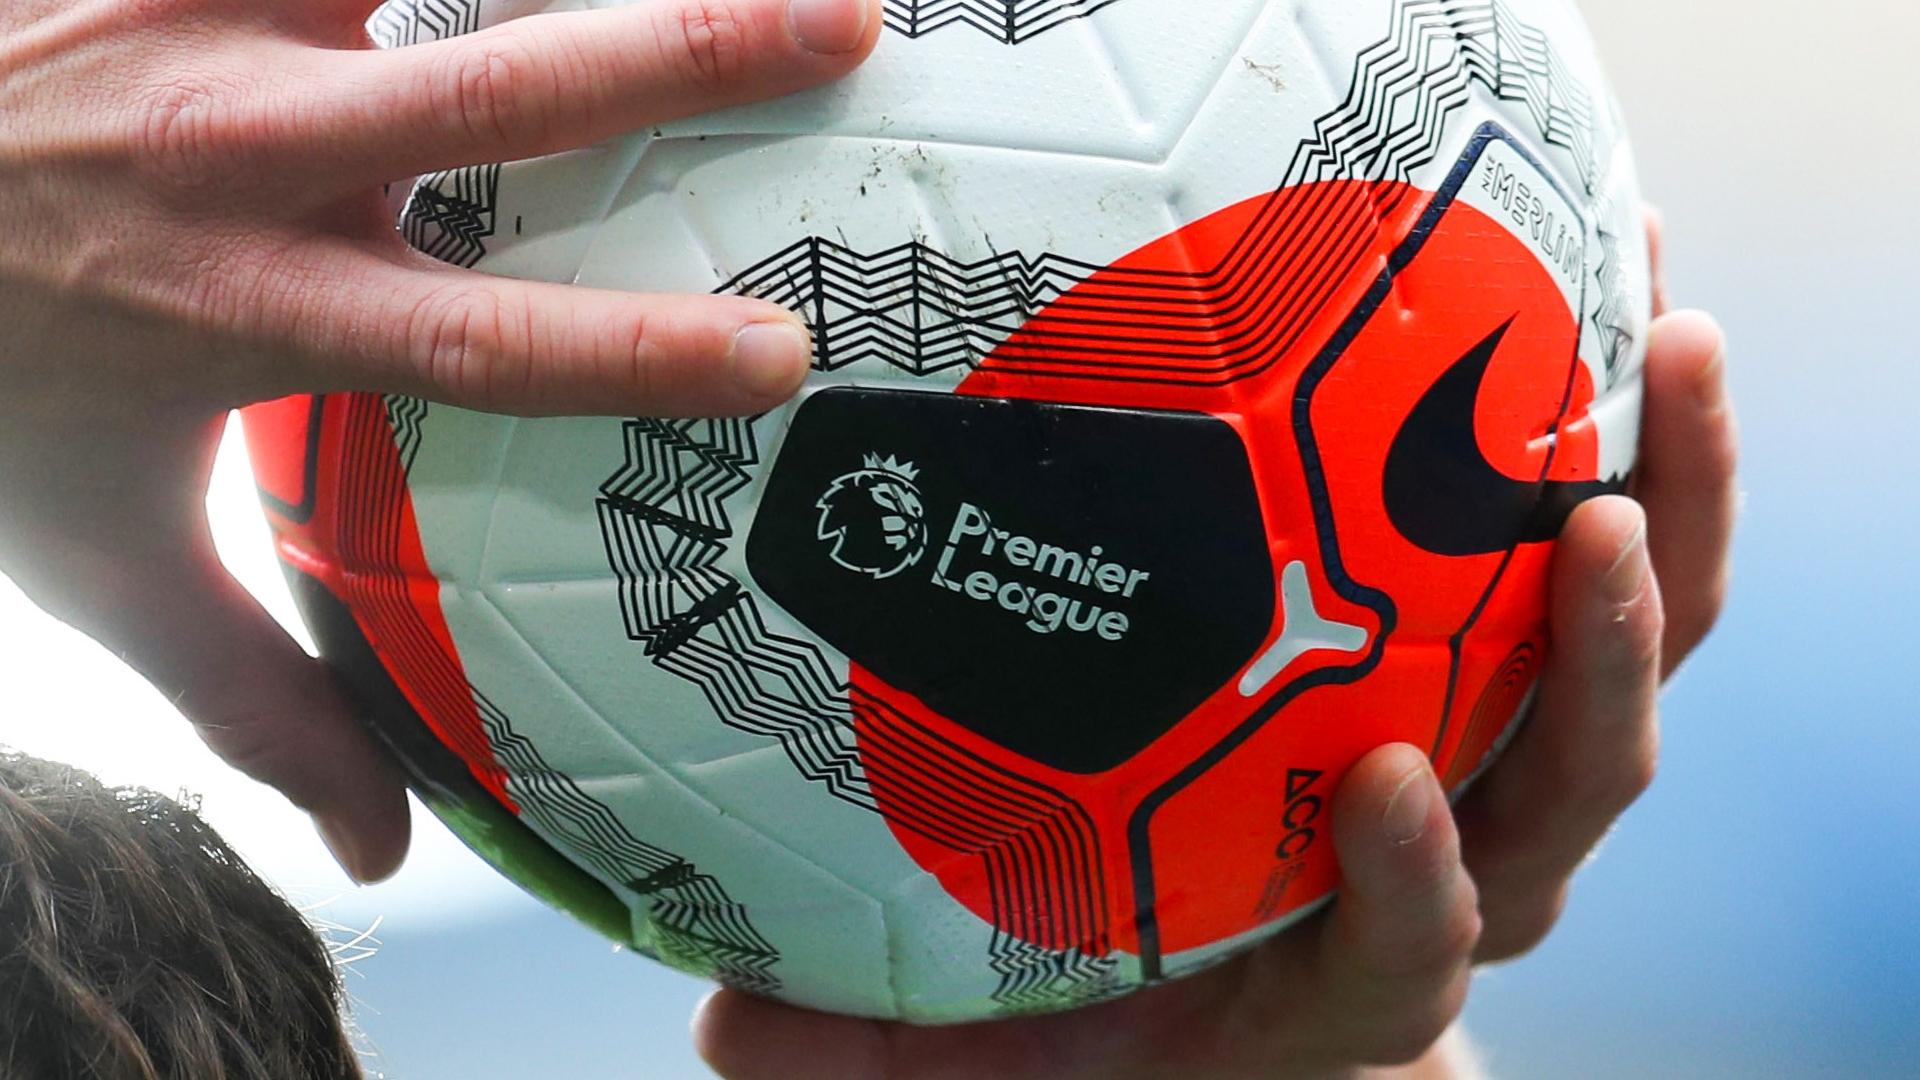 Premier League confirms no away fans for final two rounds